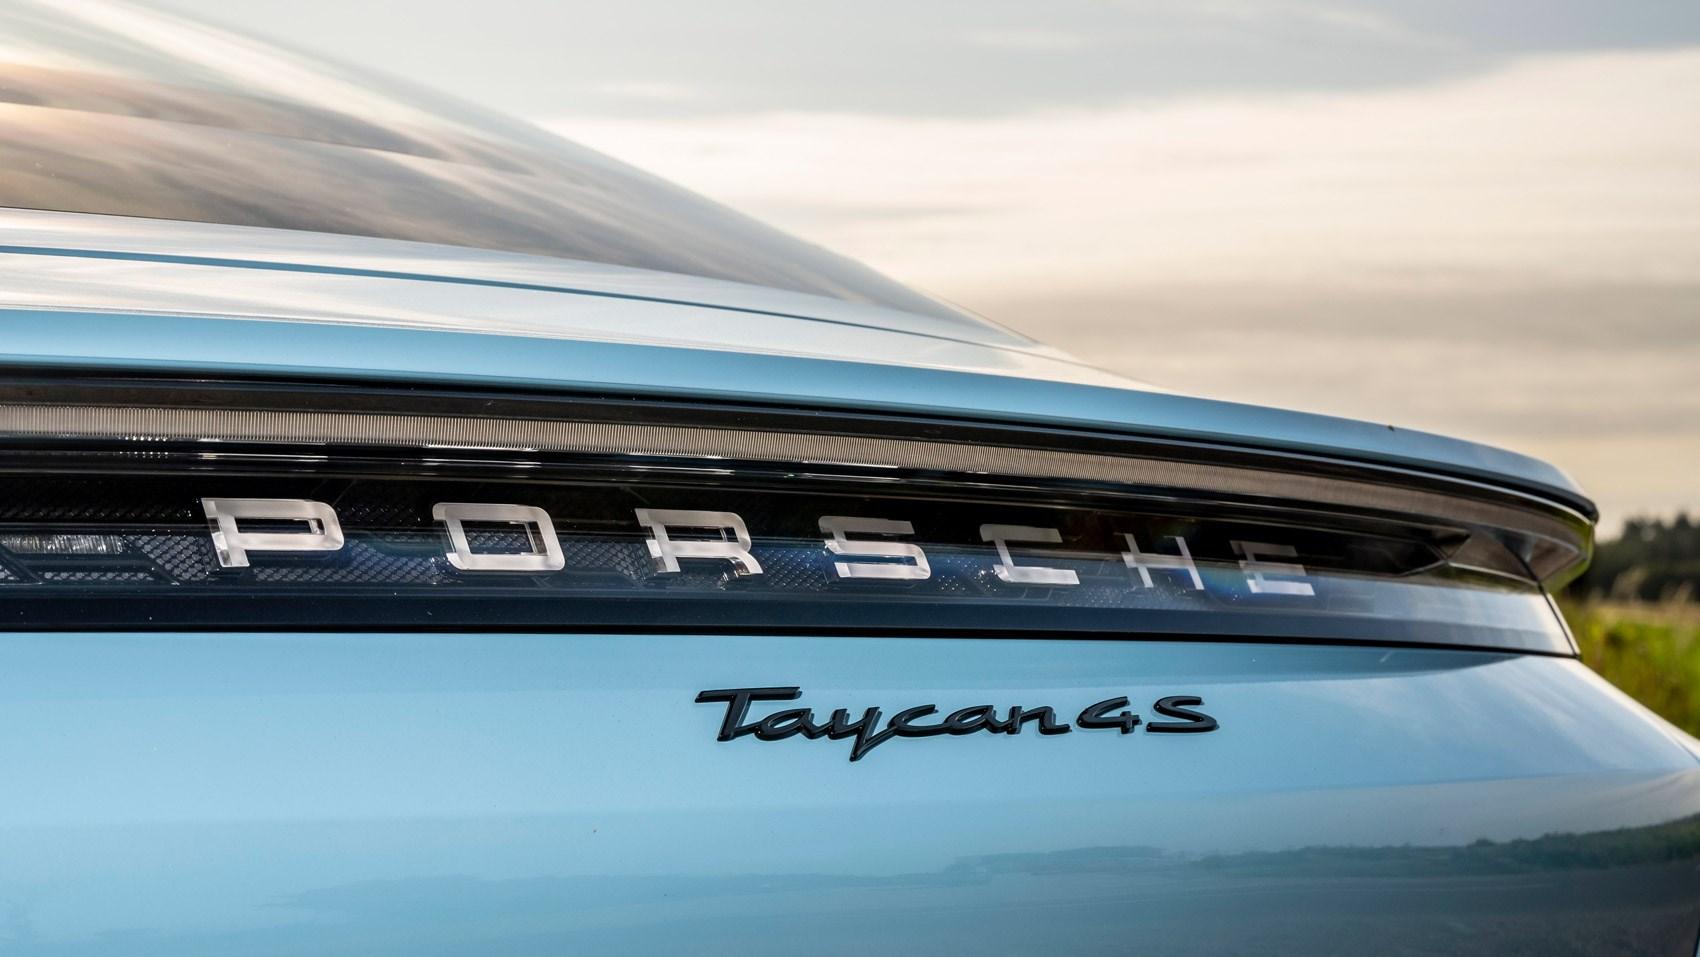 taycan 4s rear detail